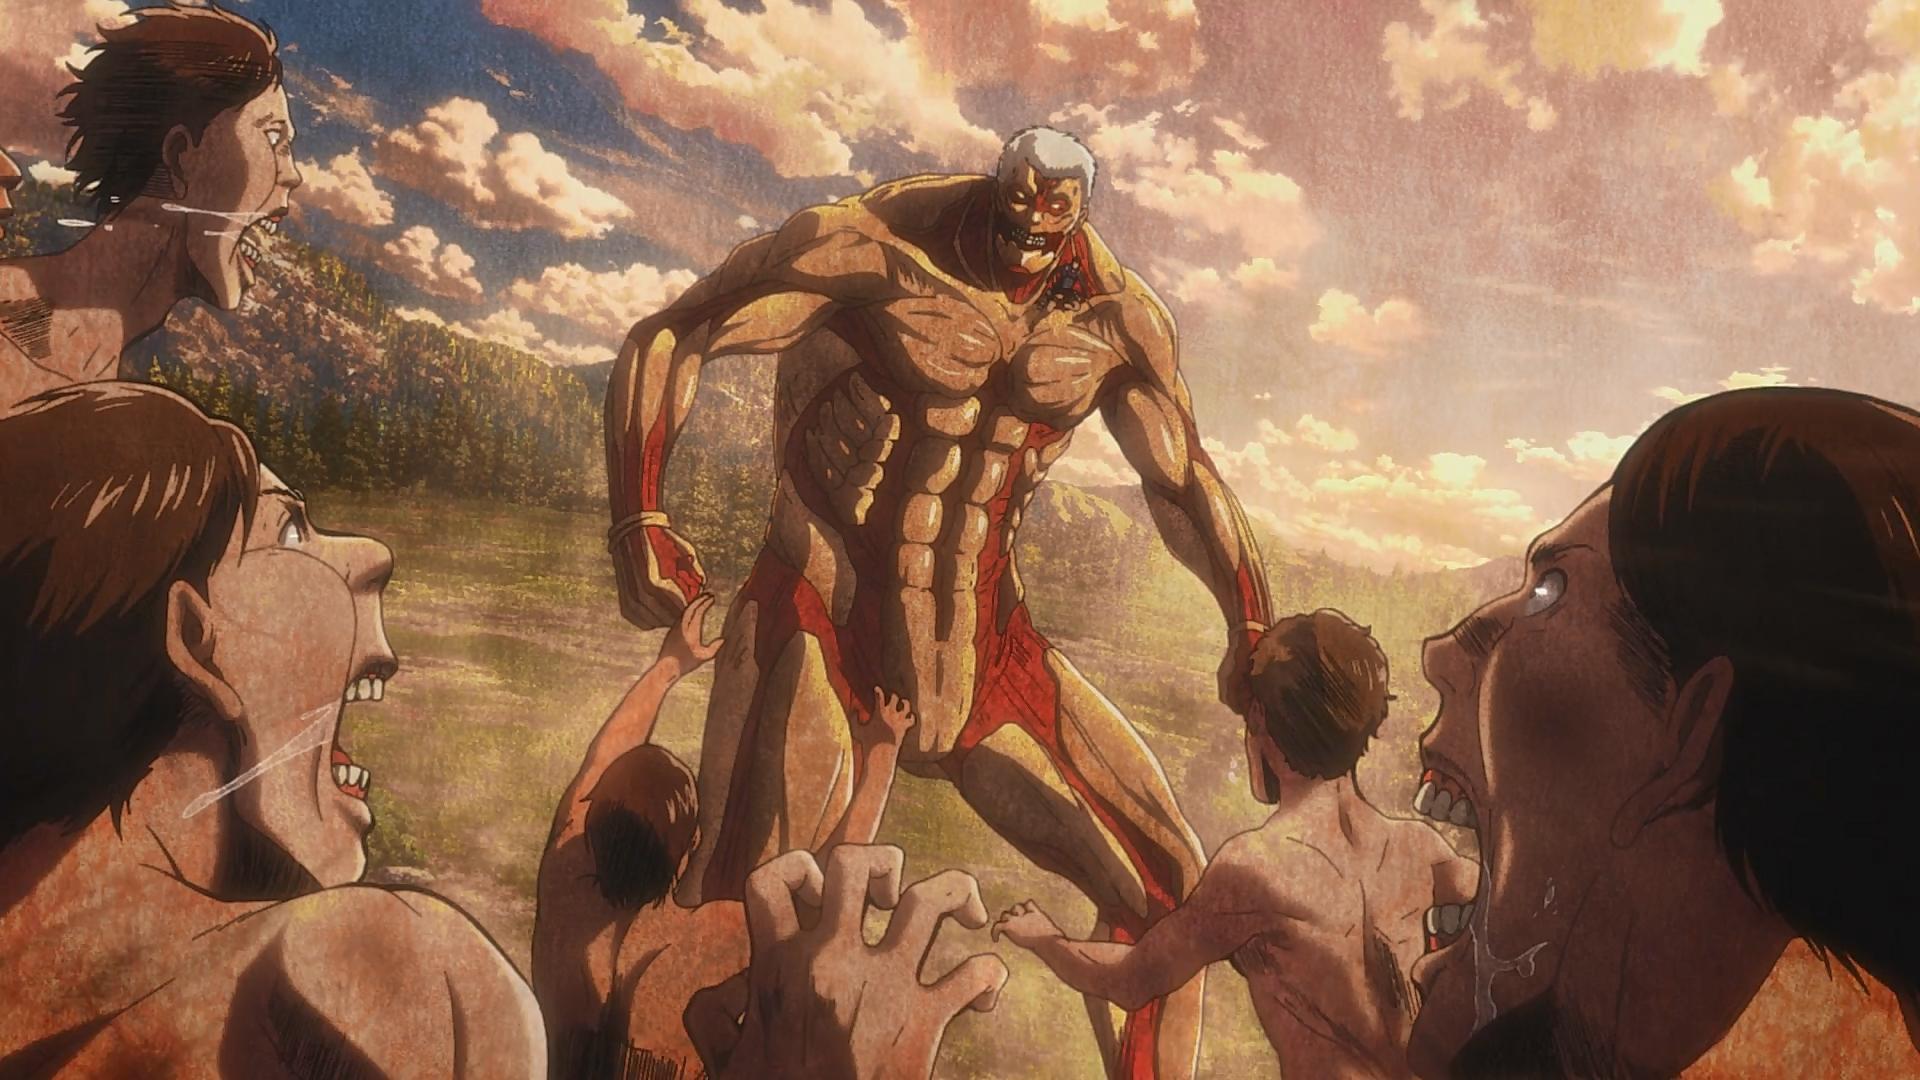 Armored Titan (Anime) | Attack on Titan Wiki | FANDOM